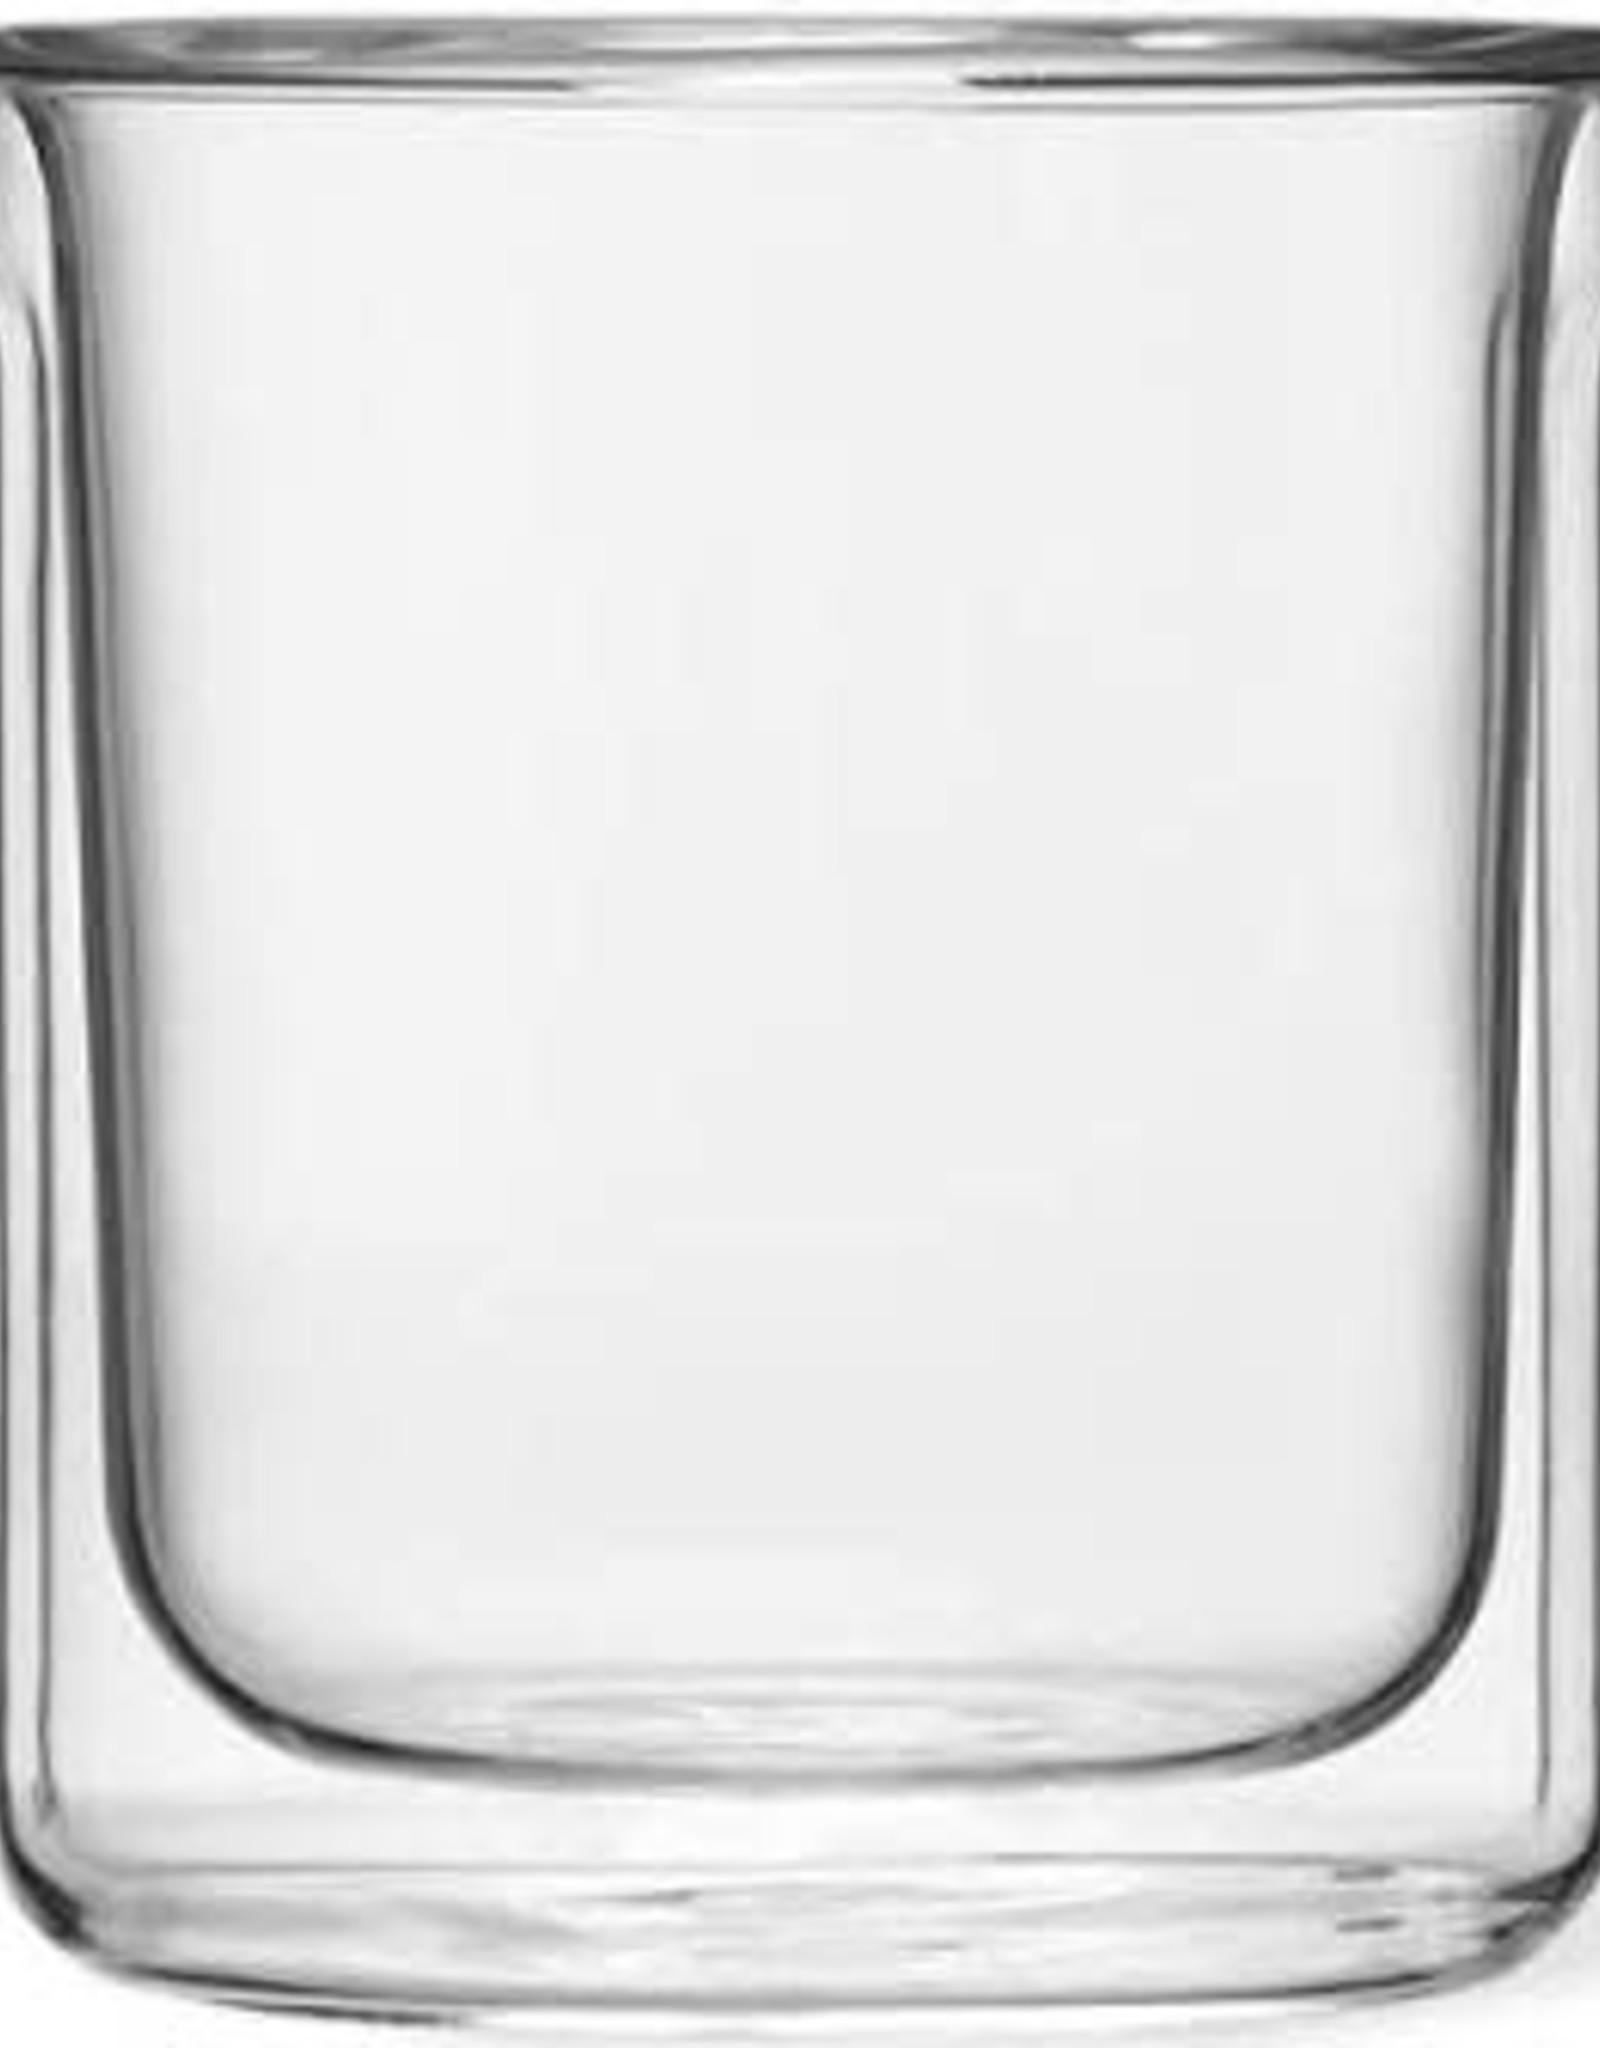 Corkcicle Clear 12oz Glass Rocks Glass - Set of 2